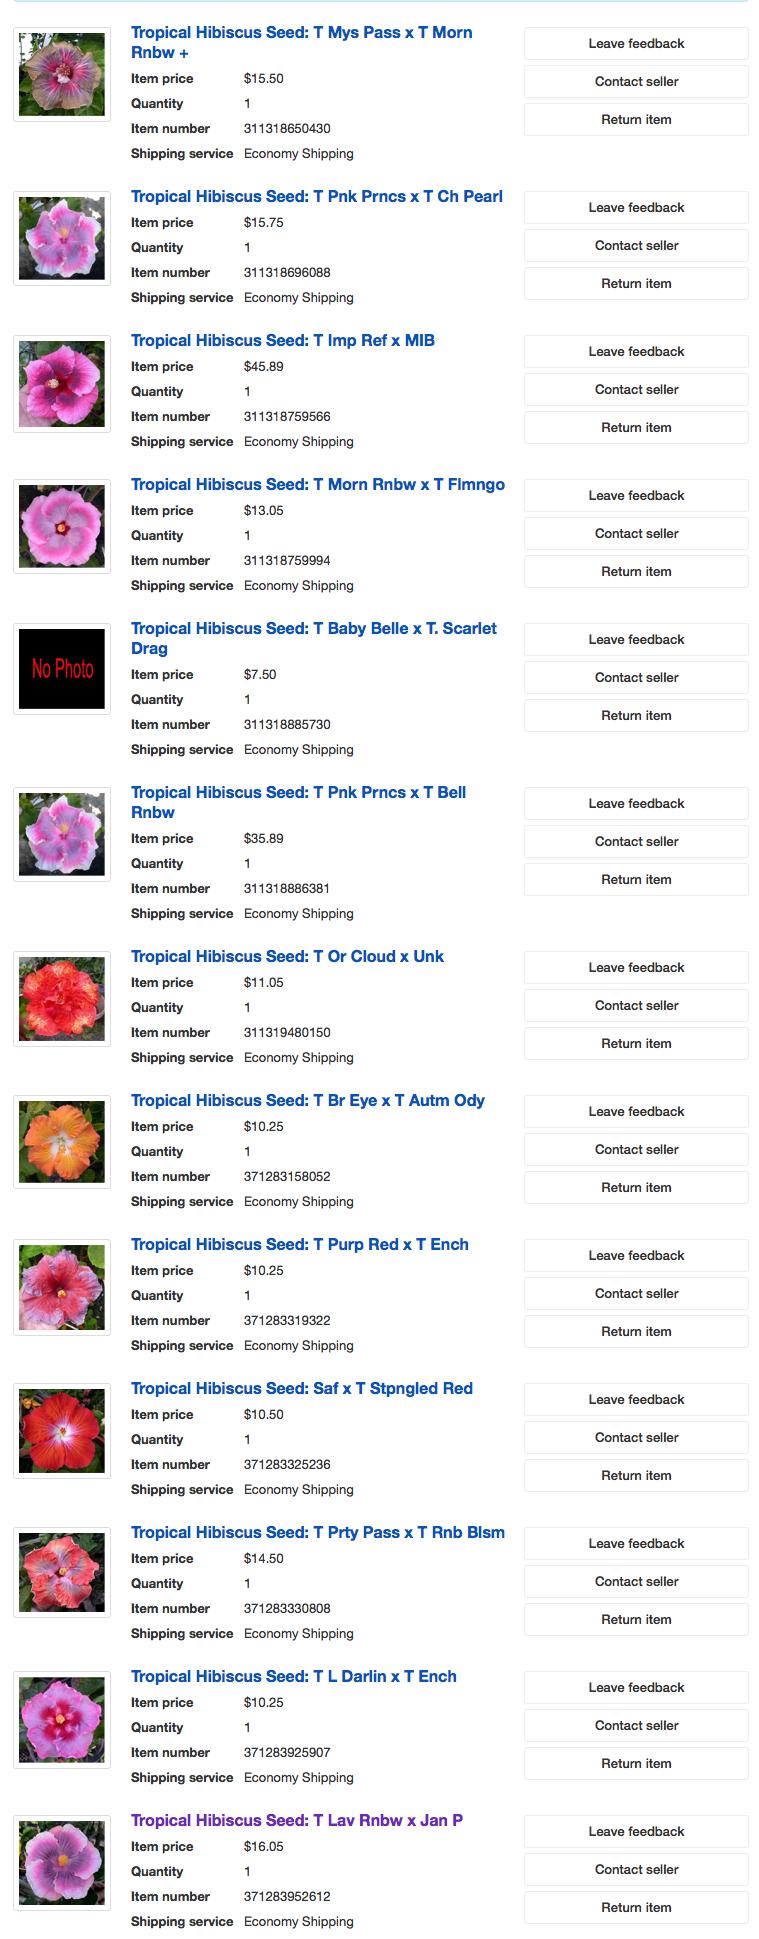 eBay Hibiscus Seed Wins